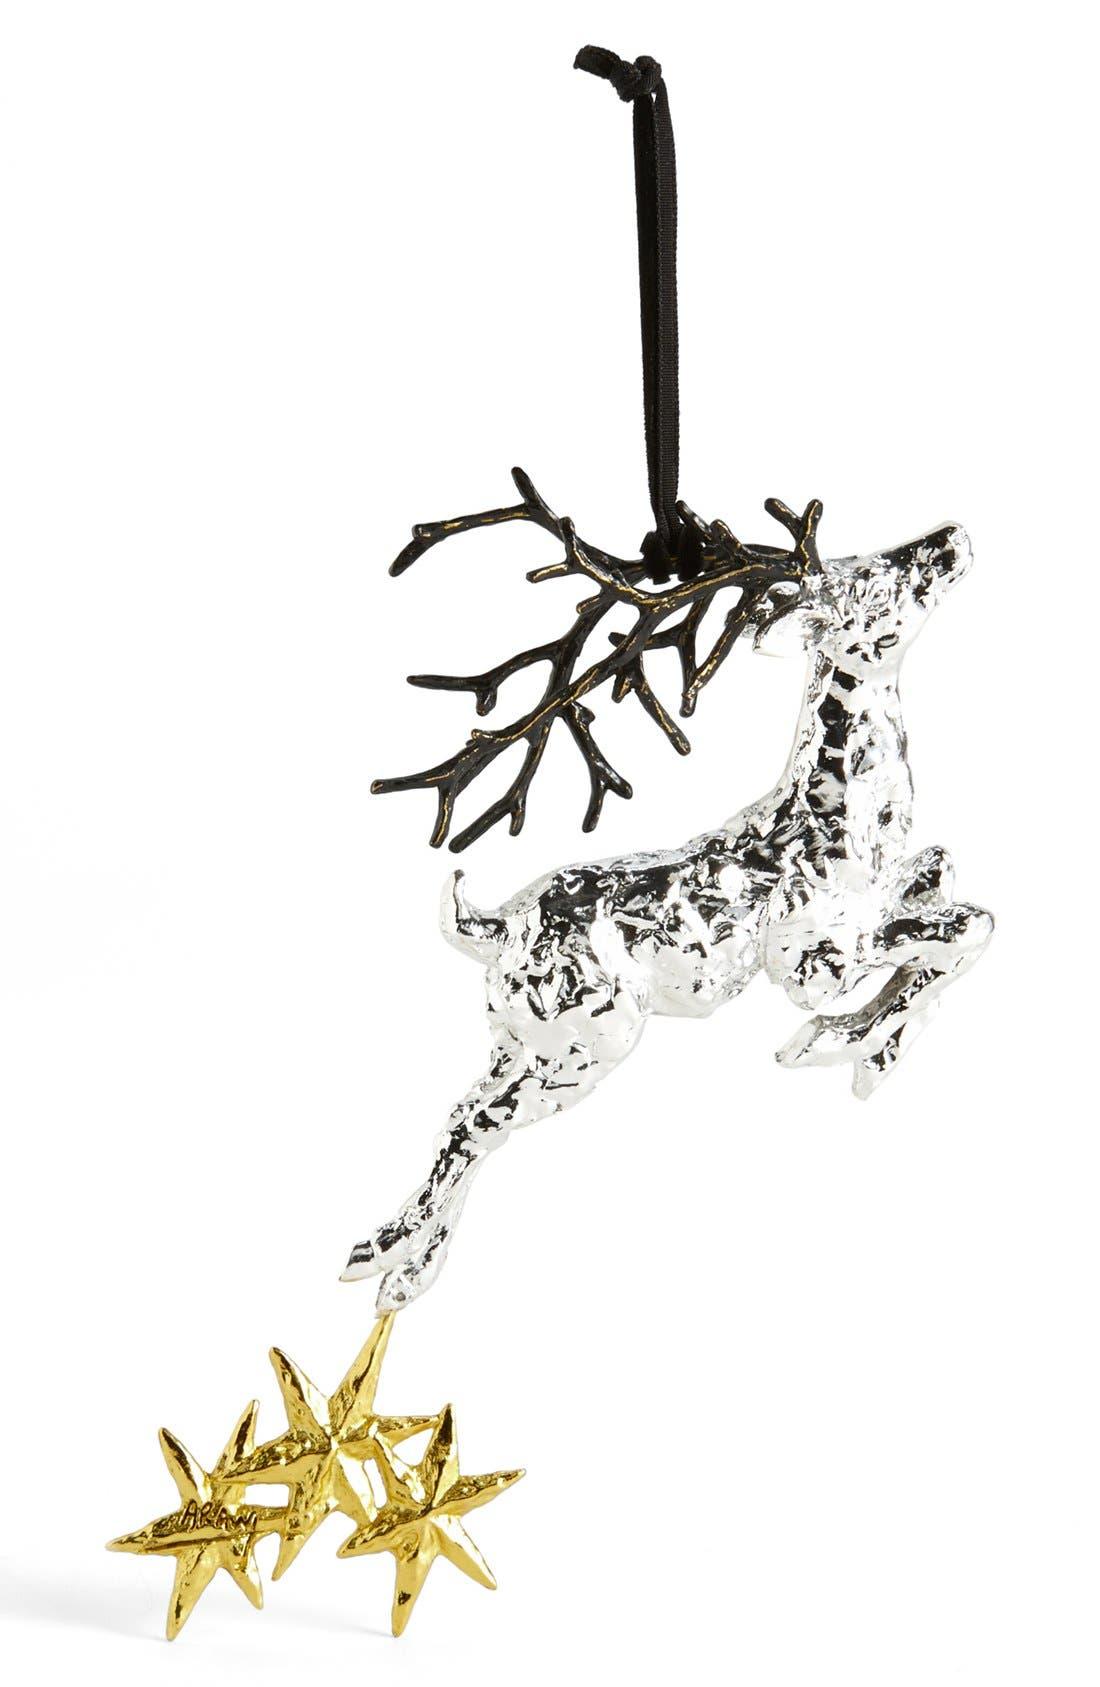 Alternate Image 1 Selected - Michael Aram 'Reindeer' Ornament